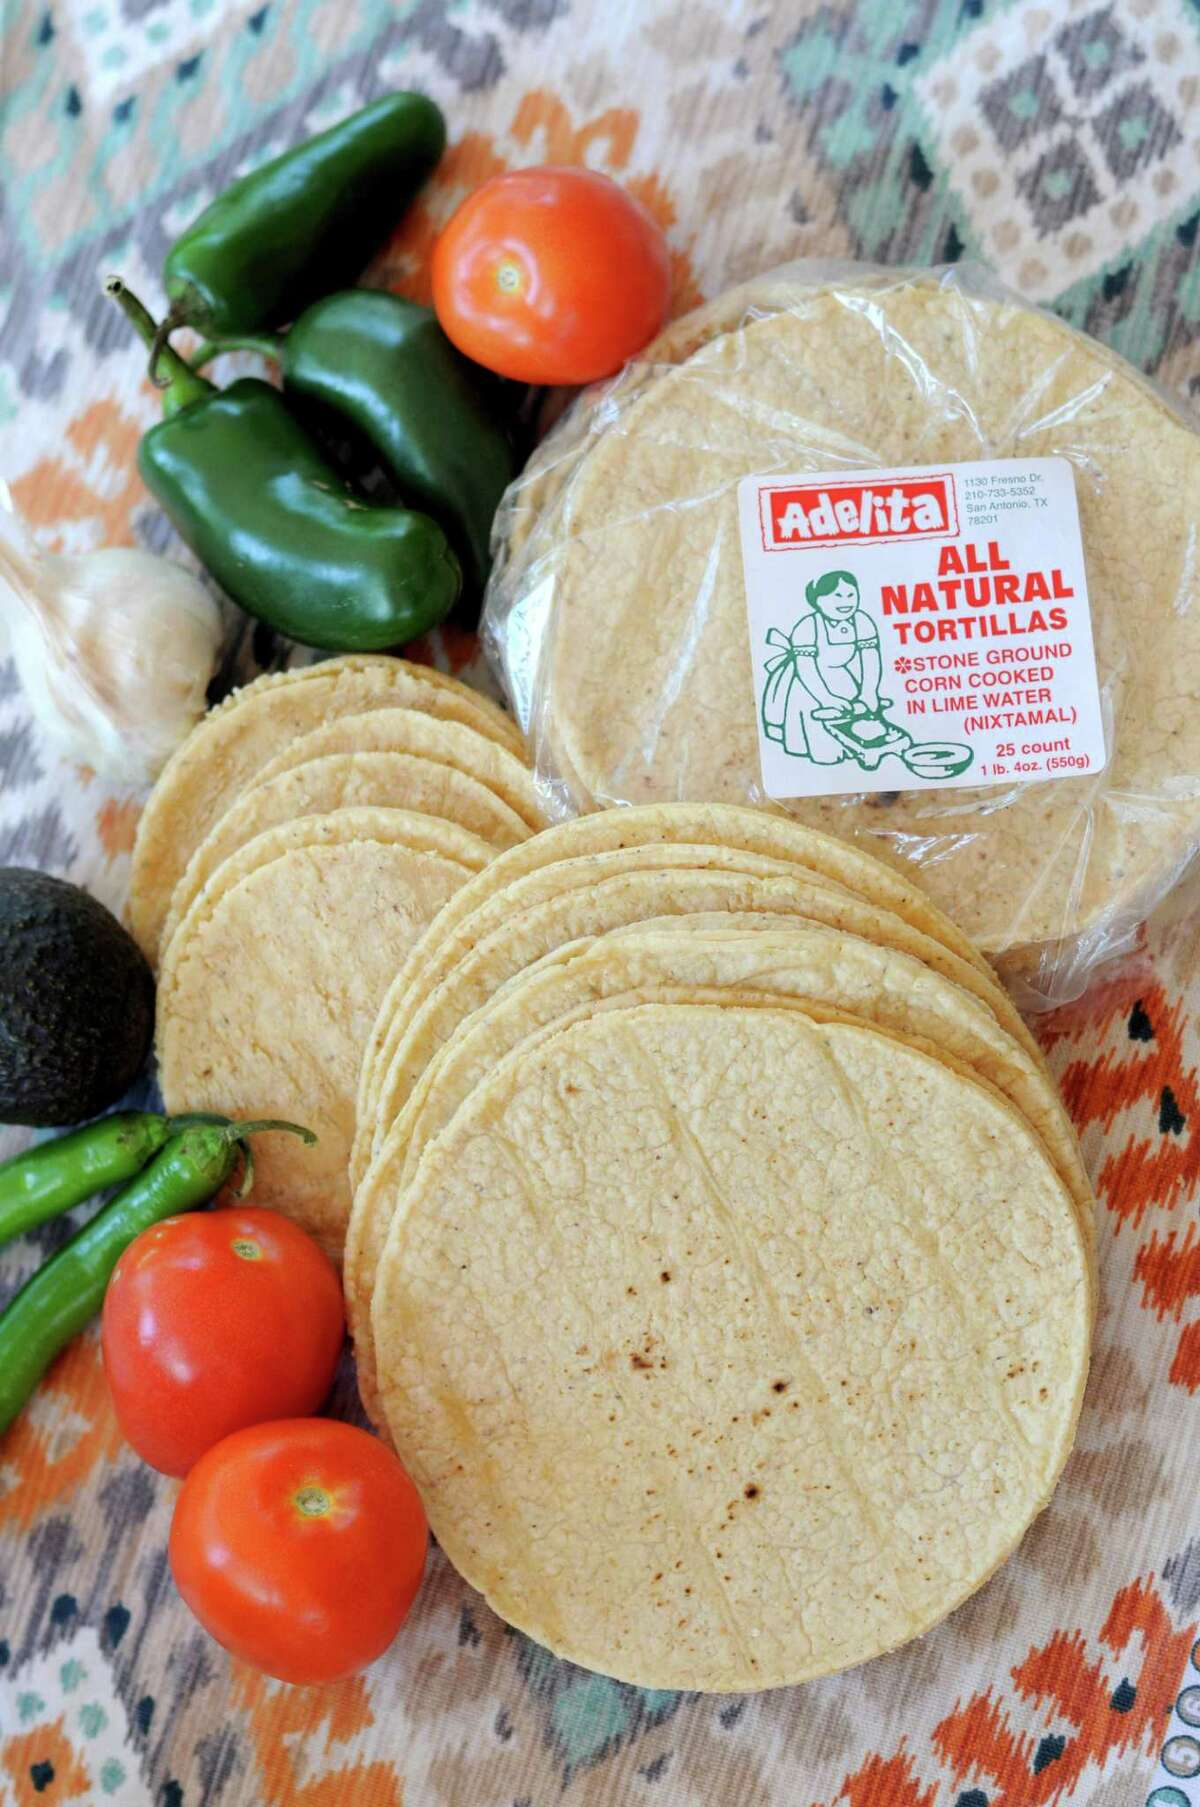 White corn tortillas from Adelita Tamales & Tortilla Factory